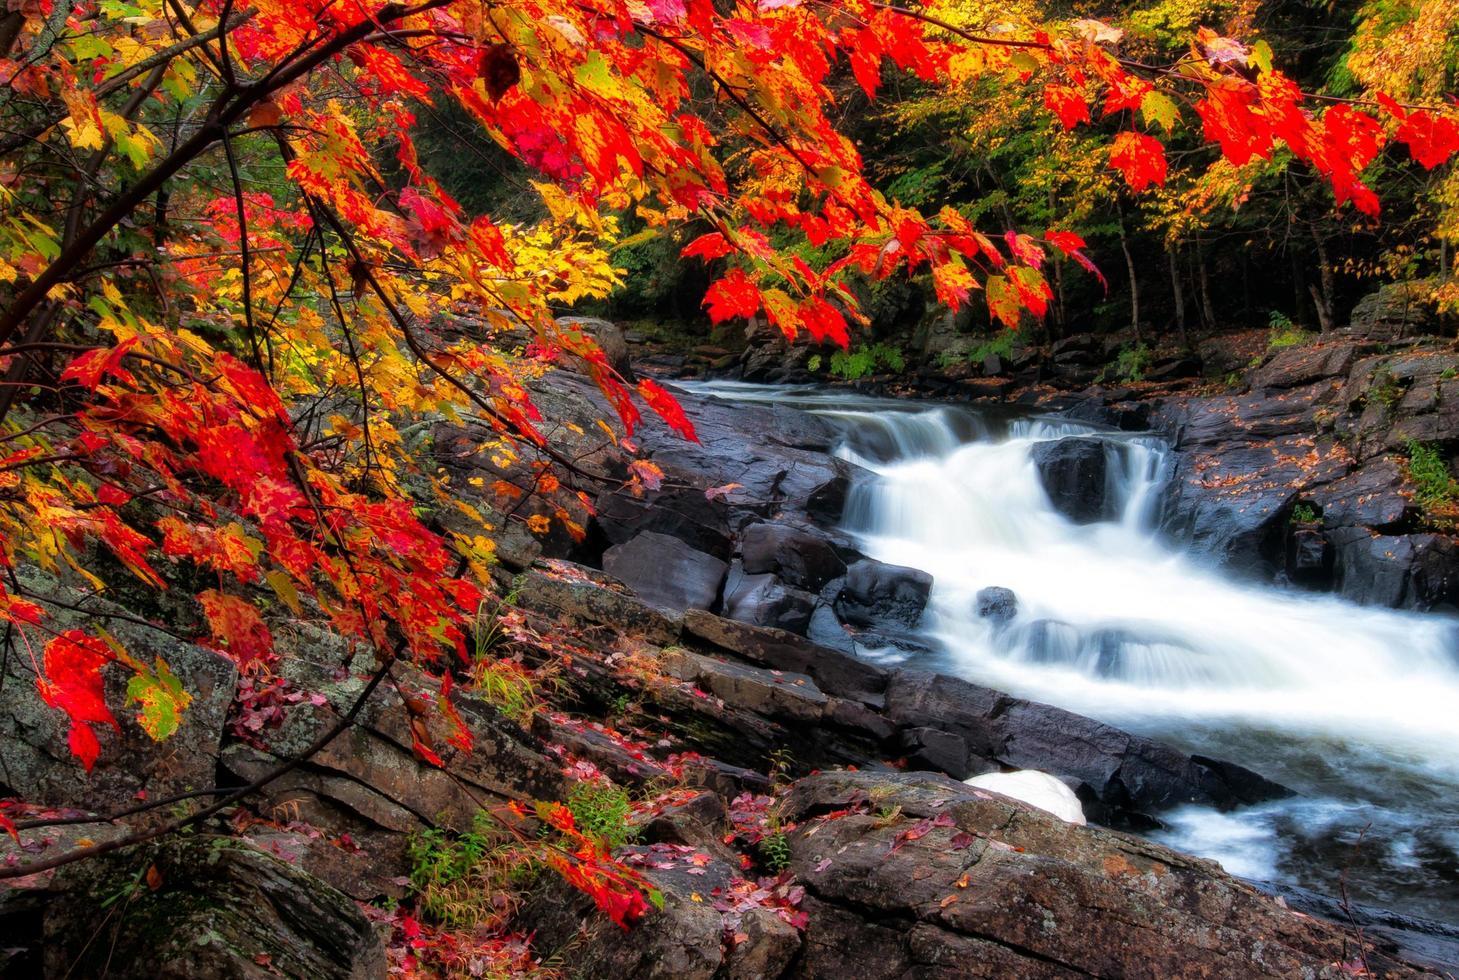 Herbstlaub und Wasserfall foto